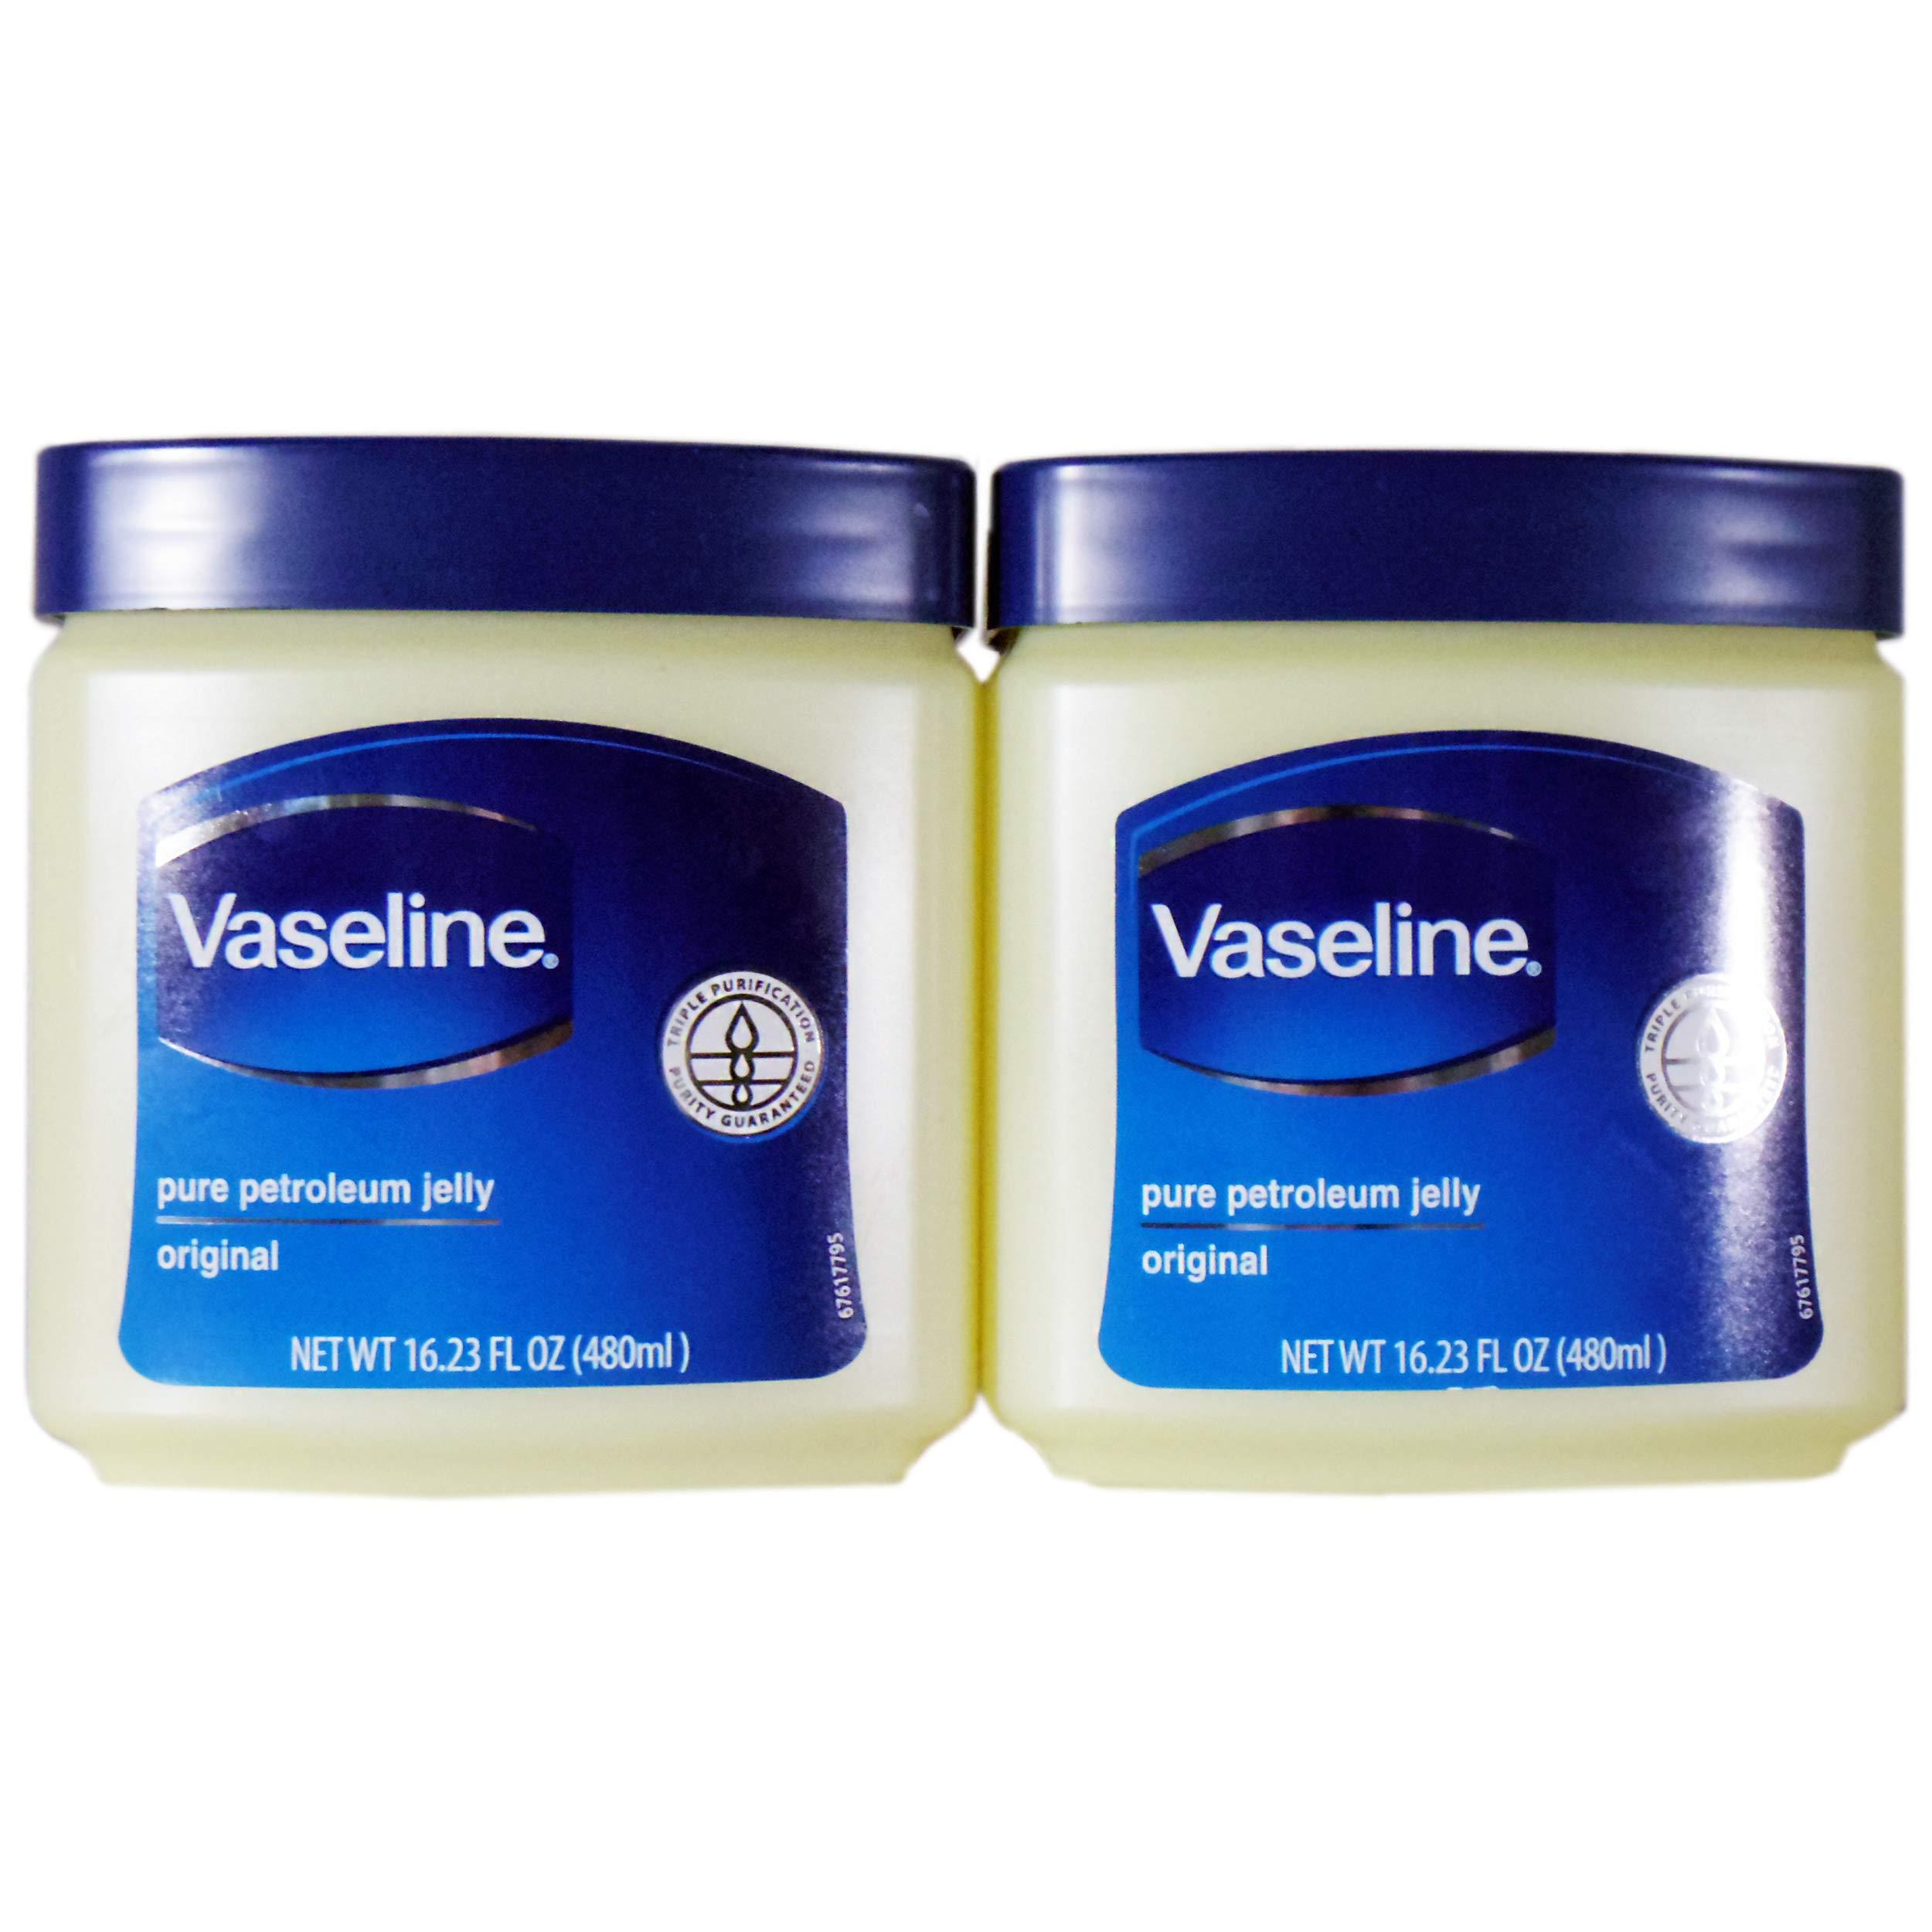 Vaseline Pure Petroleum Jelly, Original 16.23 Oz (2 Pack) by Vaseline